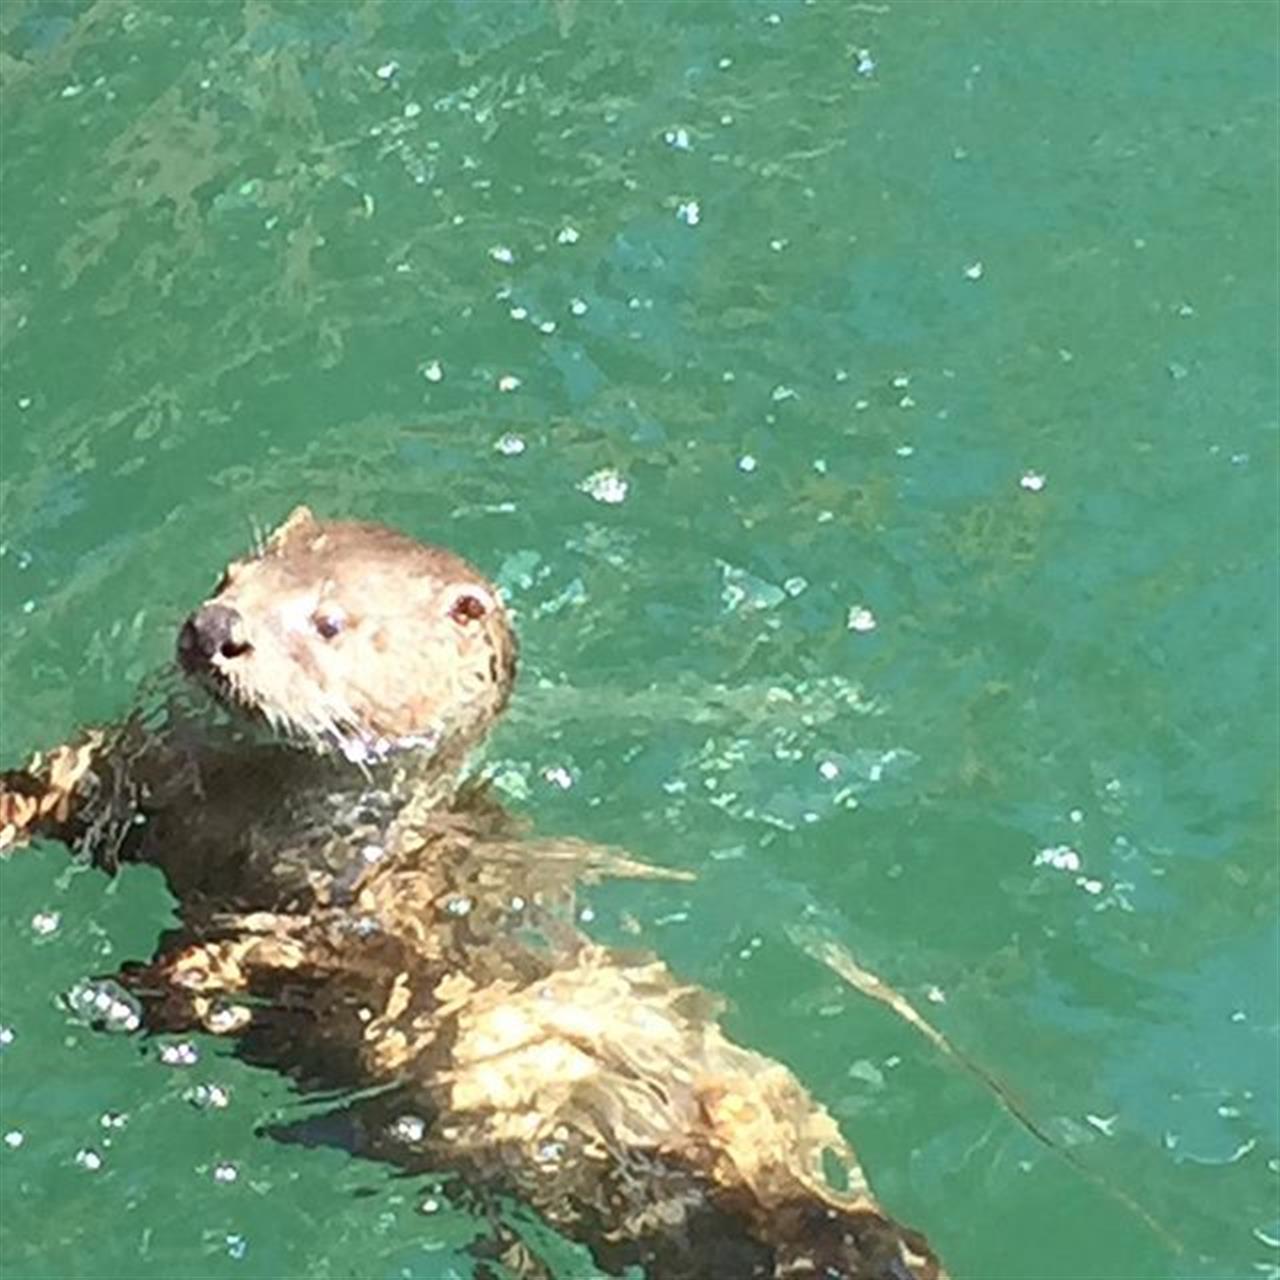 #otters #nofilter #longweekend #LeadingRElocal #realtorlife #realestateagent #realtor #oakbay #oakbaymarina